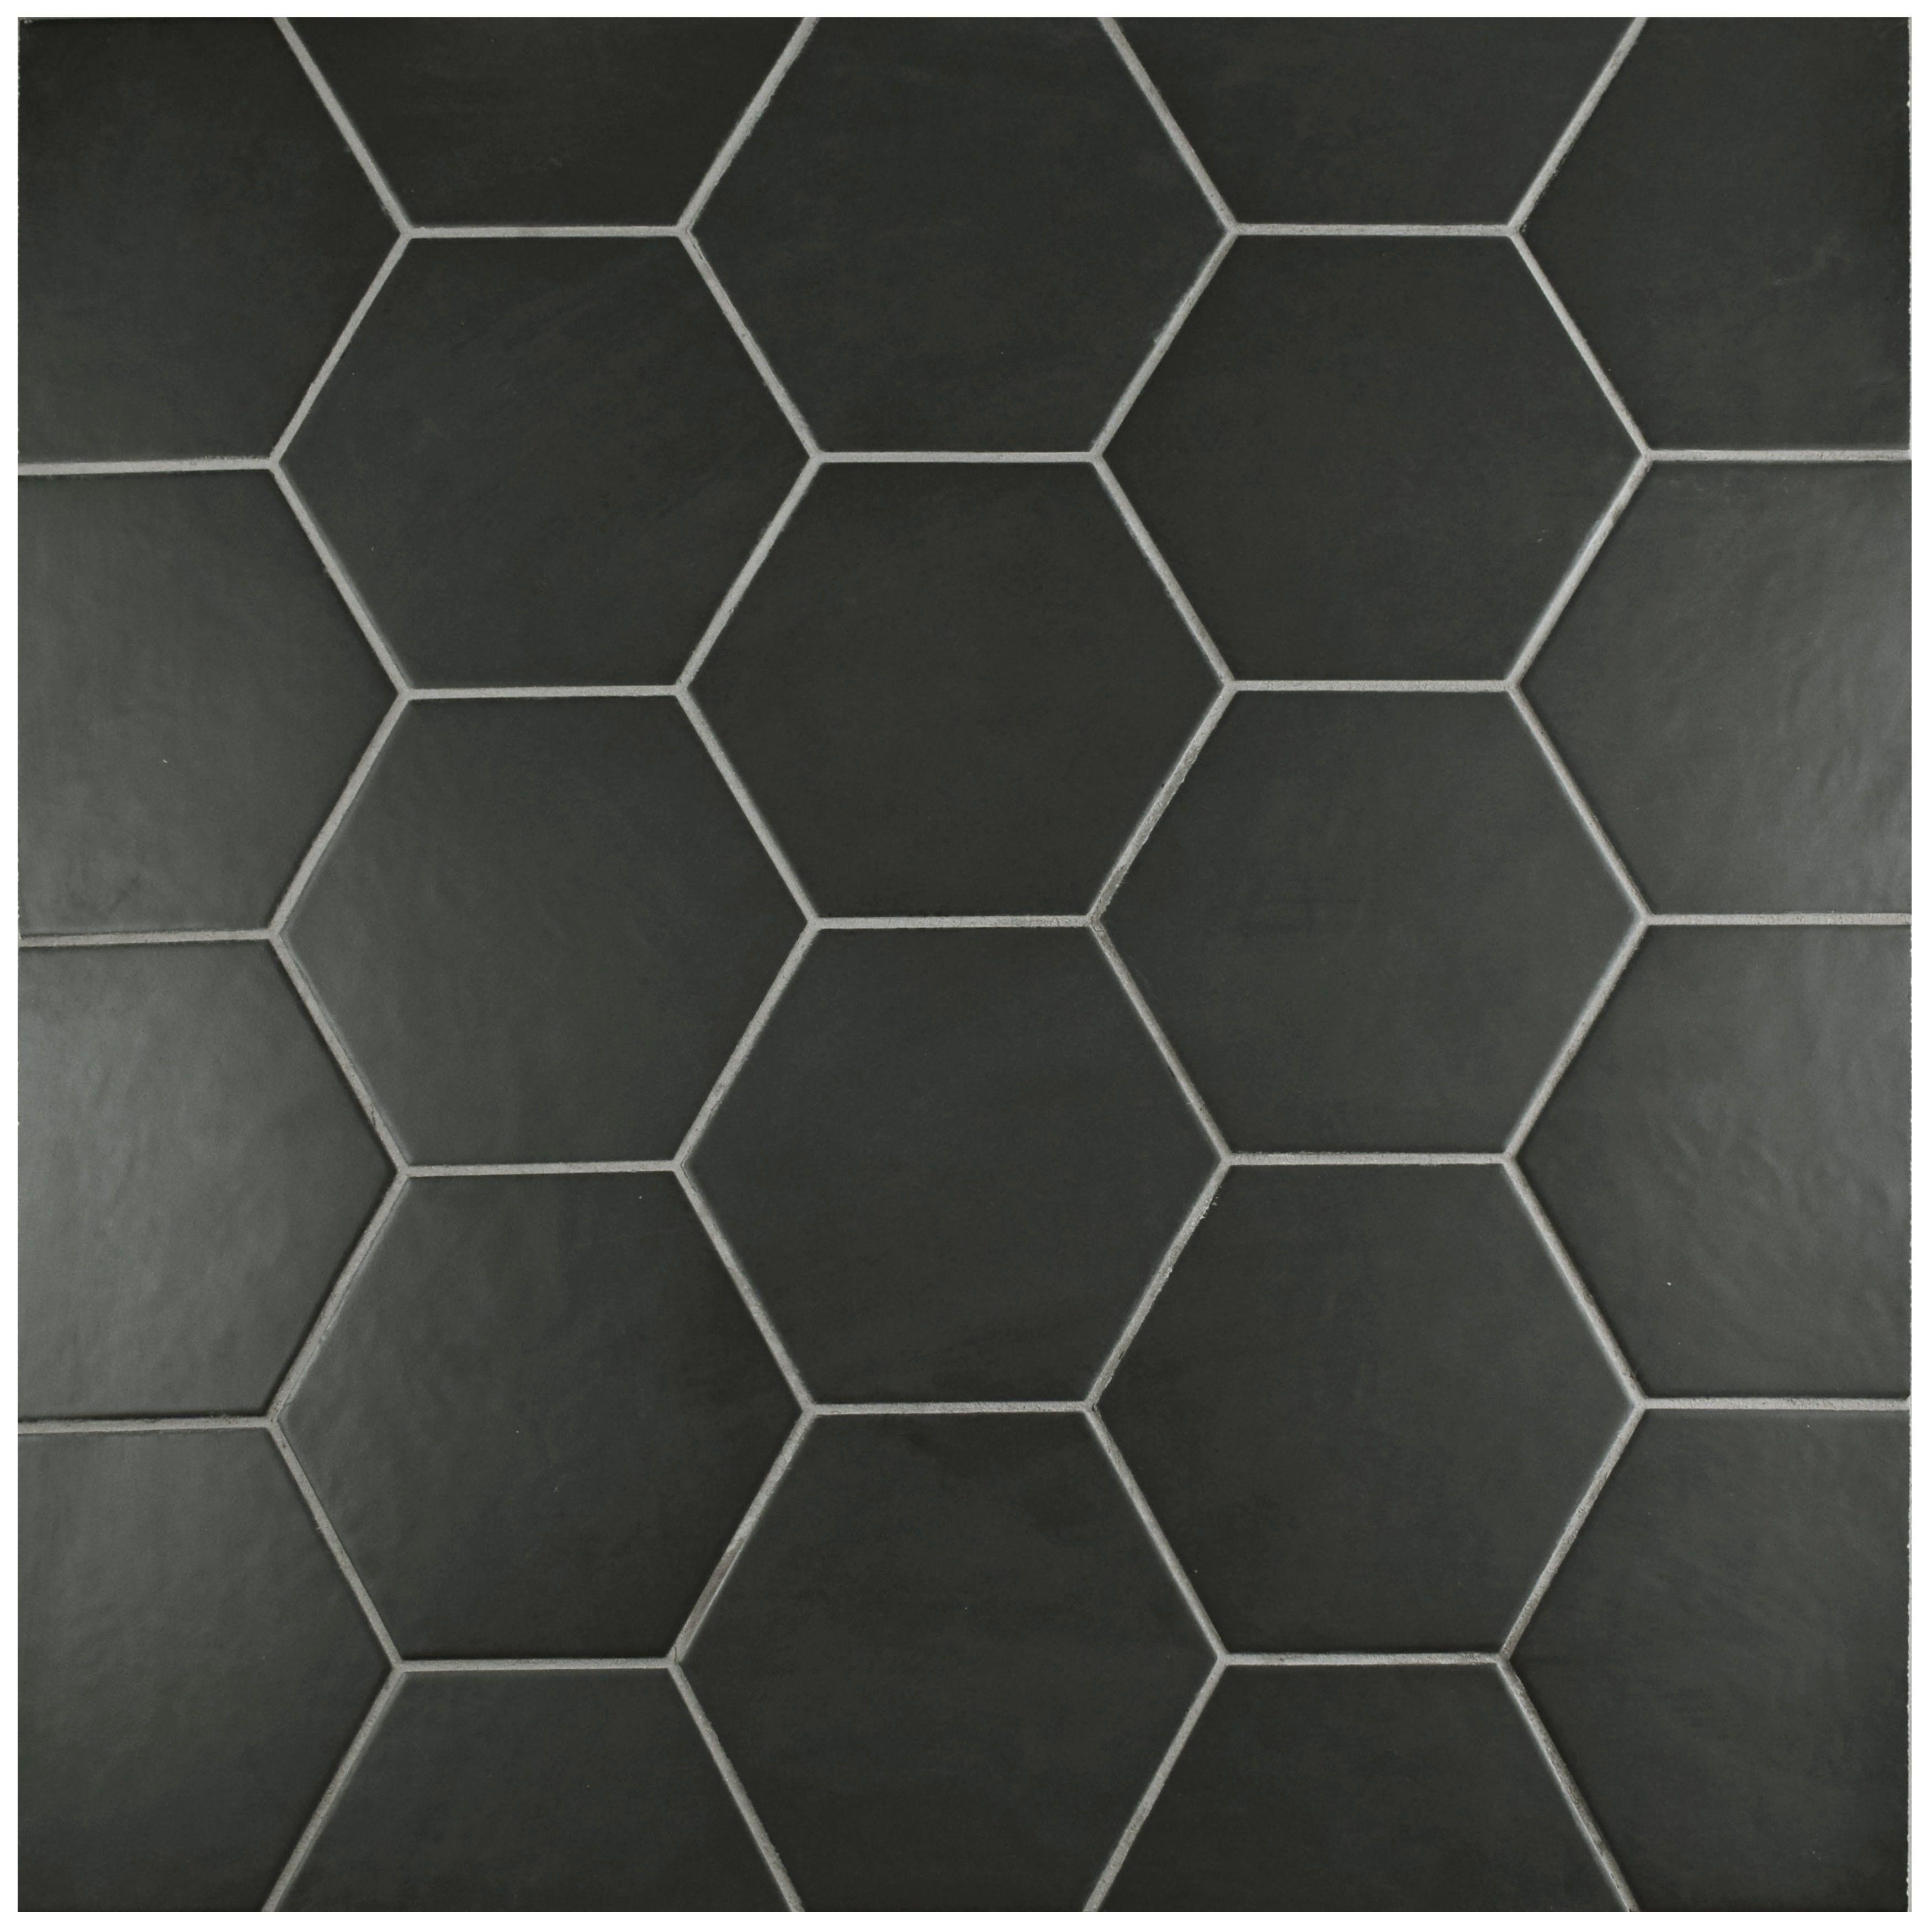 Elitetile hexitile 7 x 8 porcelain field tile in matte black